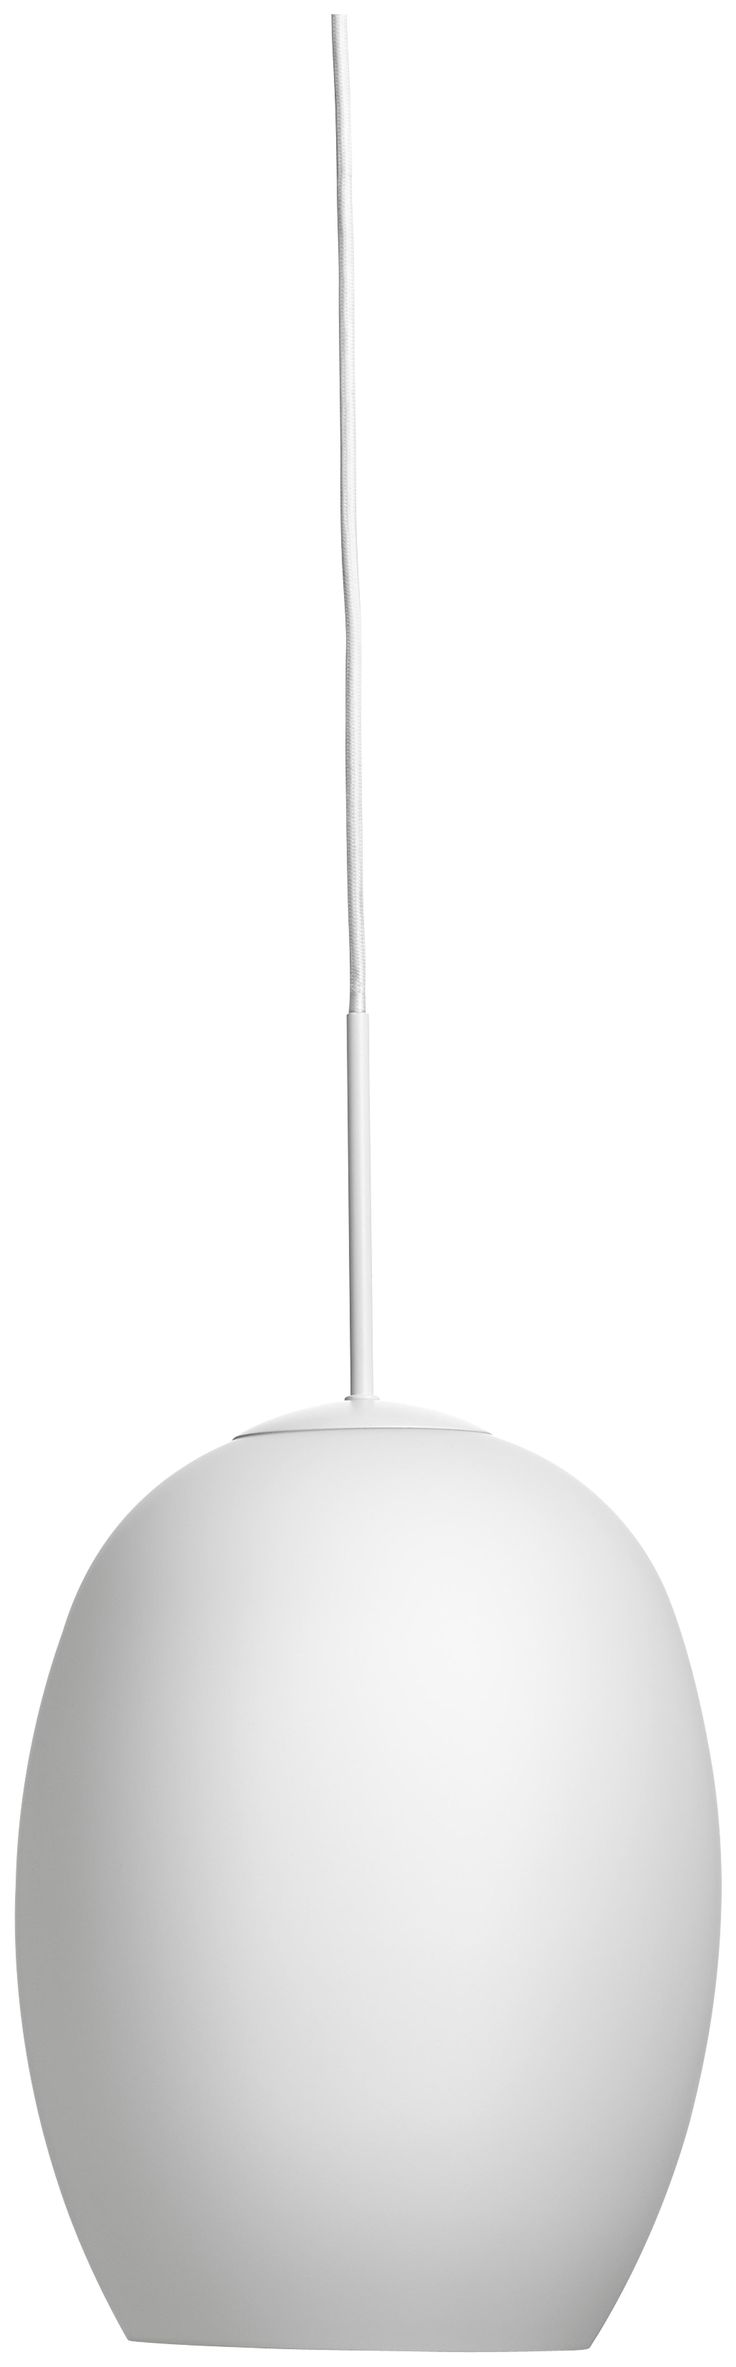 Modern pendants - Quality from BoConcept